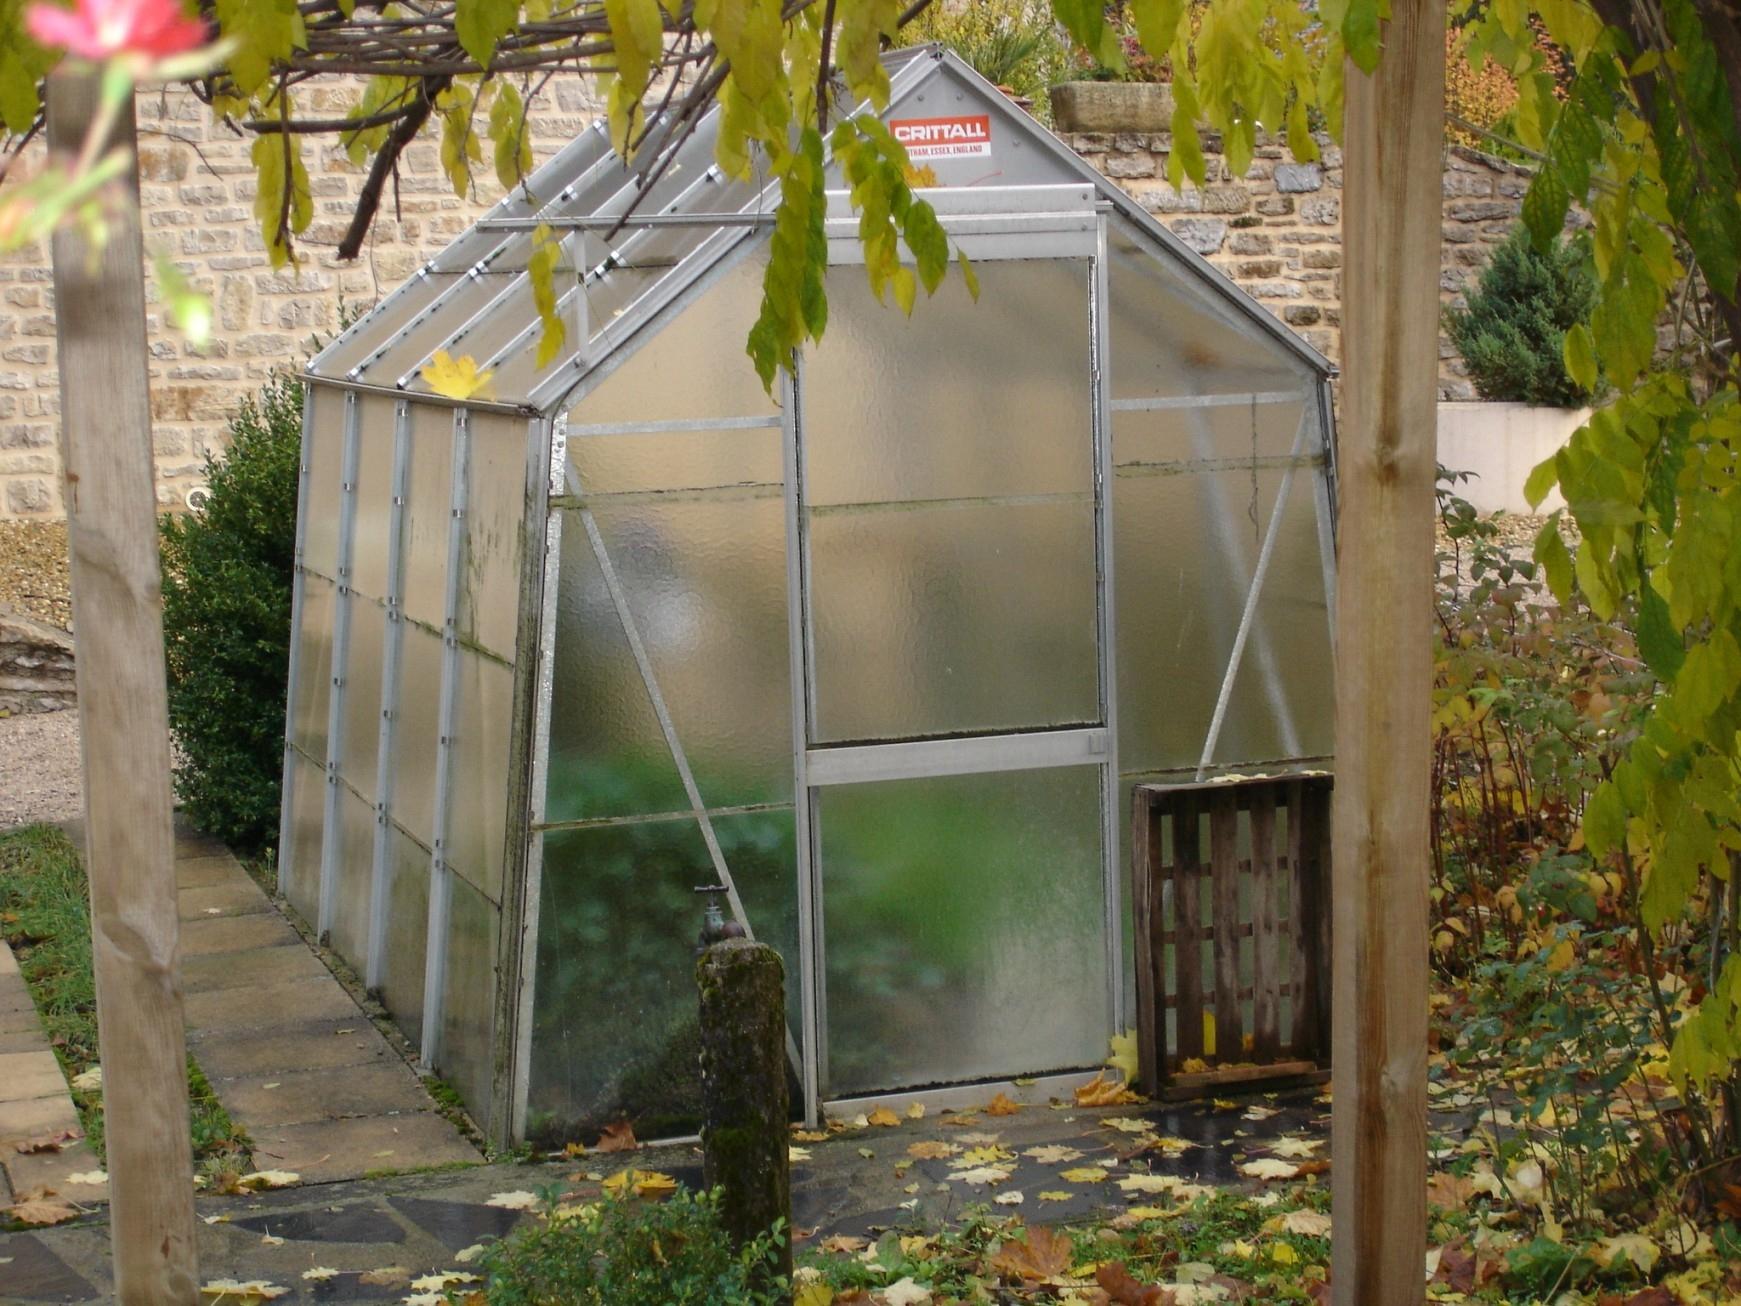 Serre De Jardin Le Bon Coin - Veranda Et Abri Jardin pour Le Bon Coin Abri De Jardin